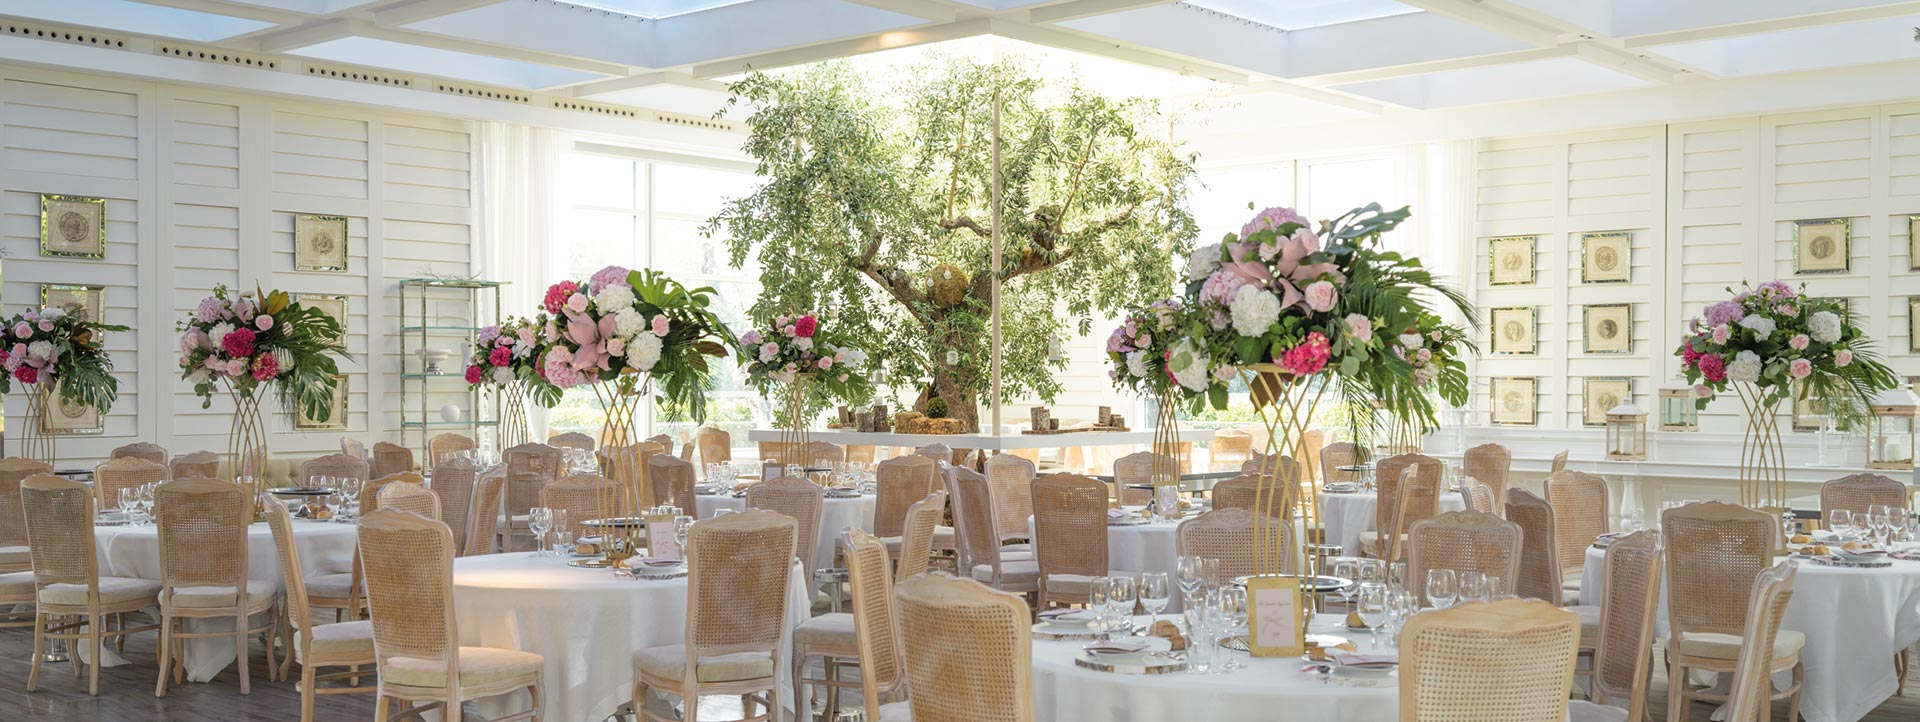 Ville con giardino per matrimoni